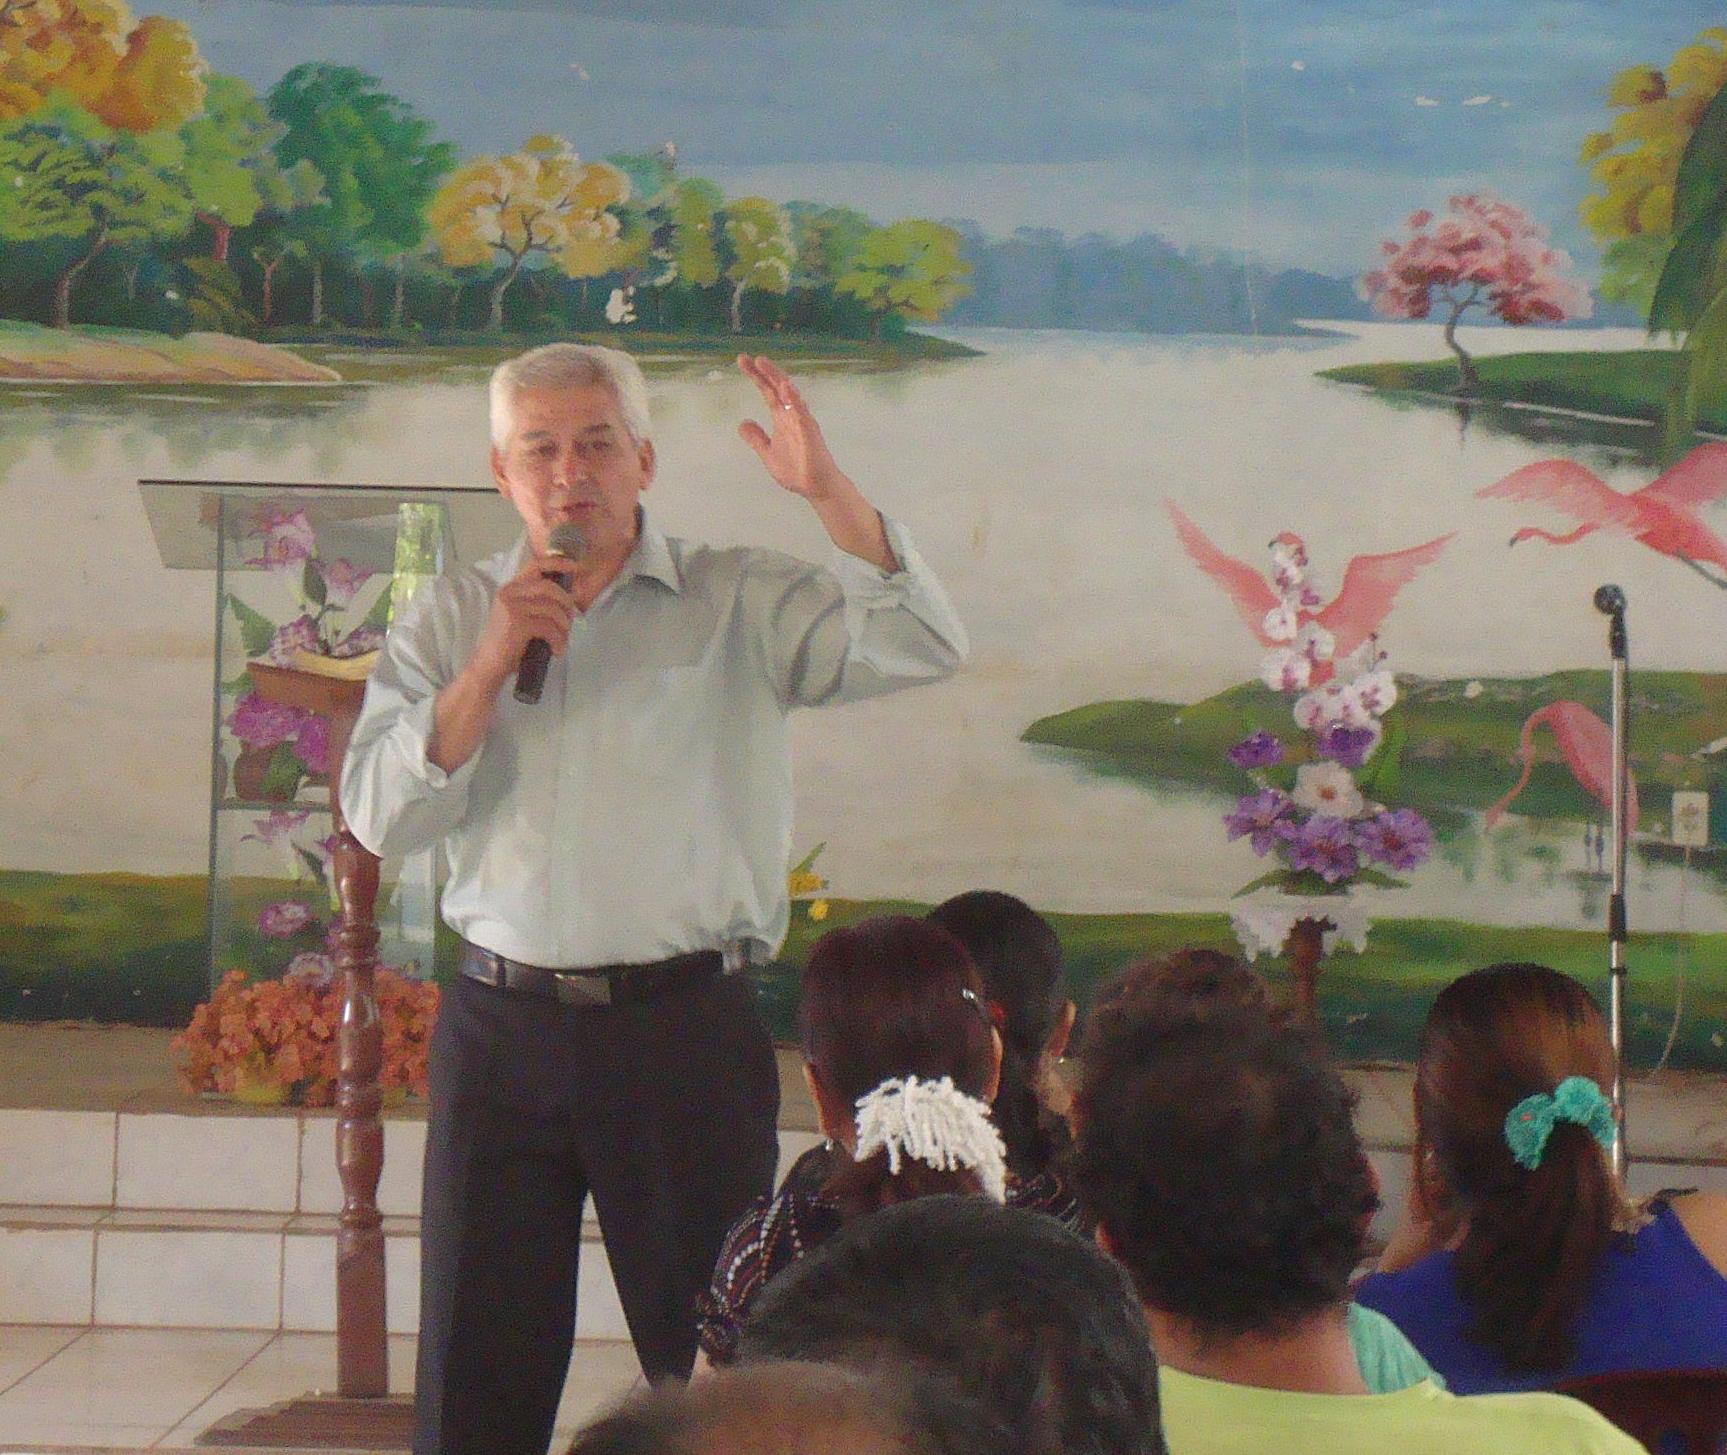 Rev. Nilson Mendoza Chavez, Bolivian Missionary and Project Coordinator